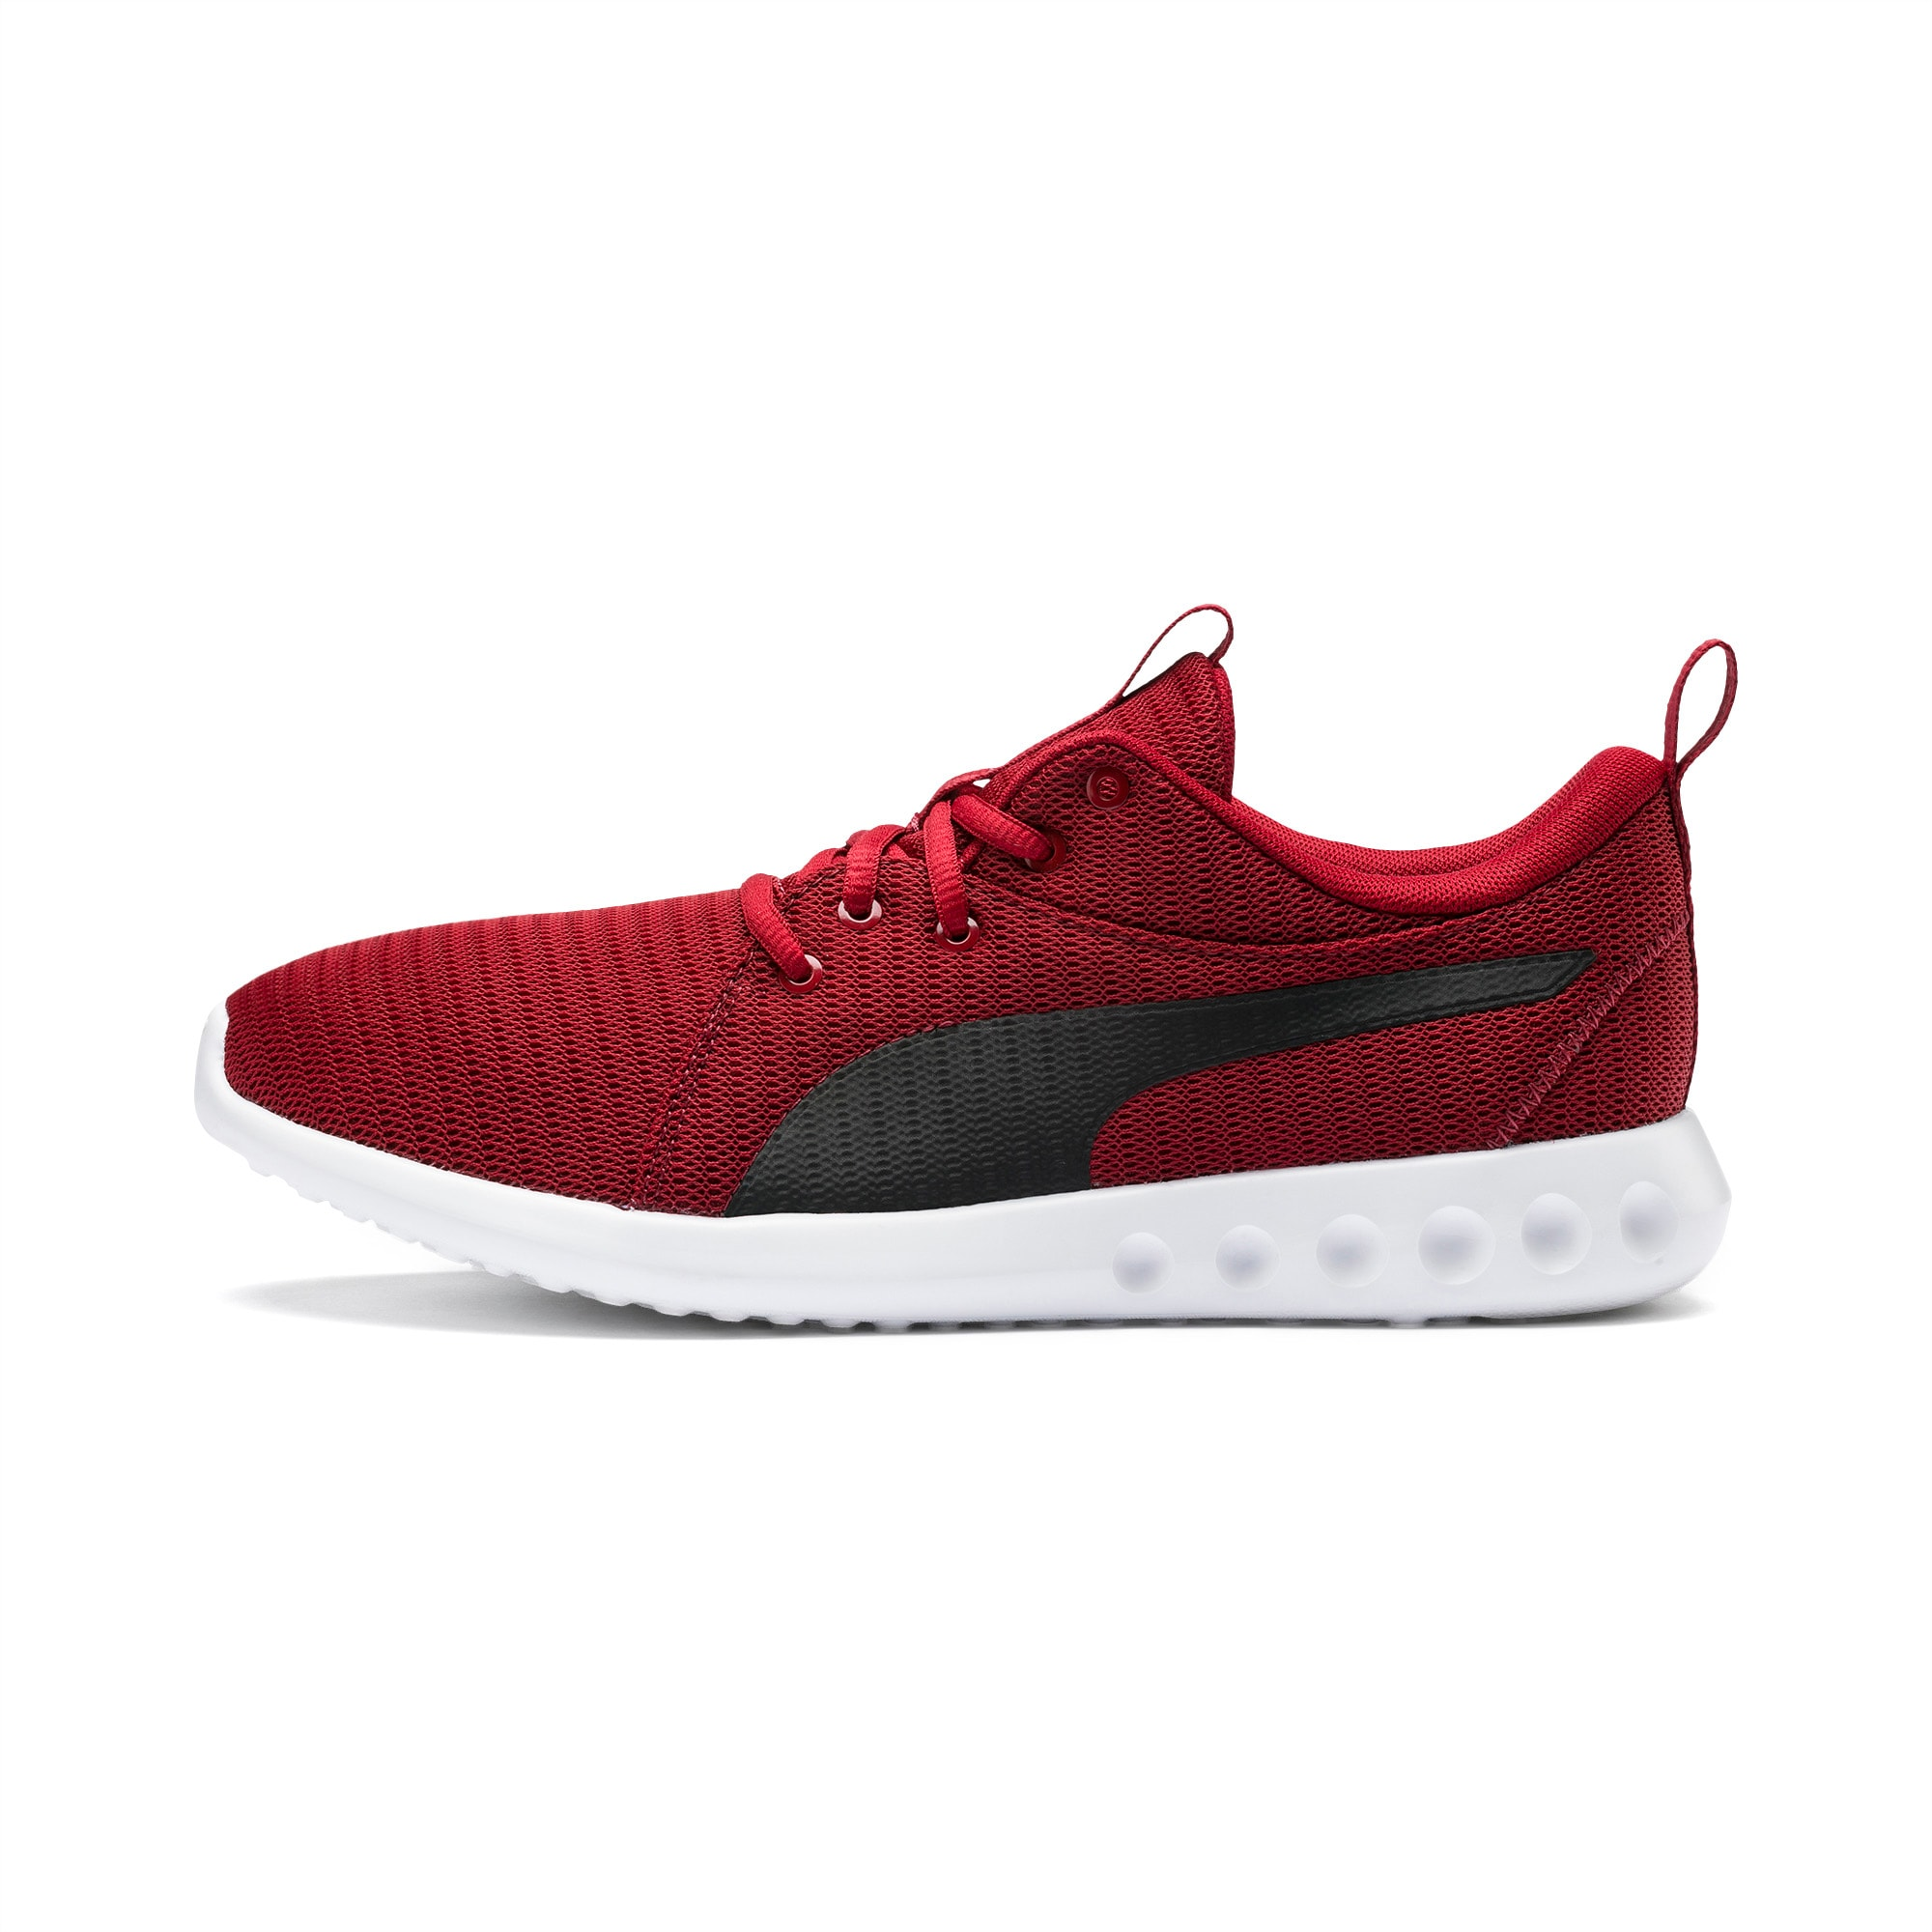 Carson 2 Men's Running Shoes